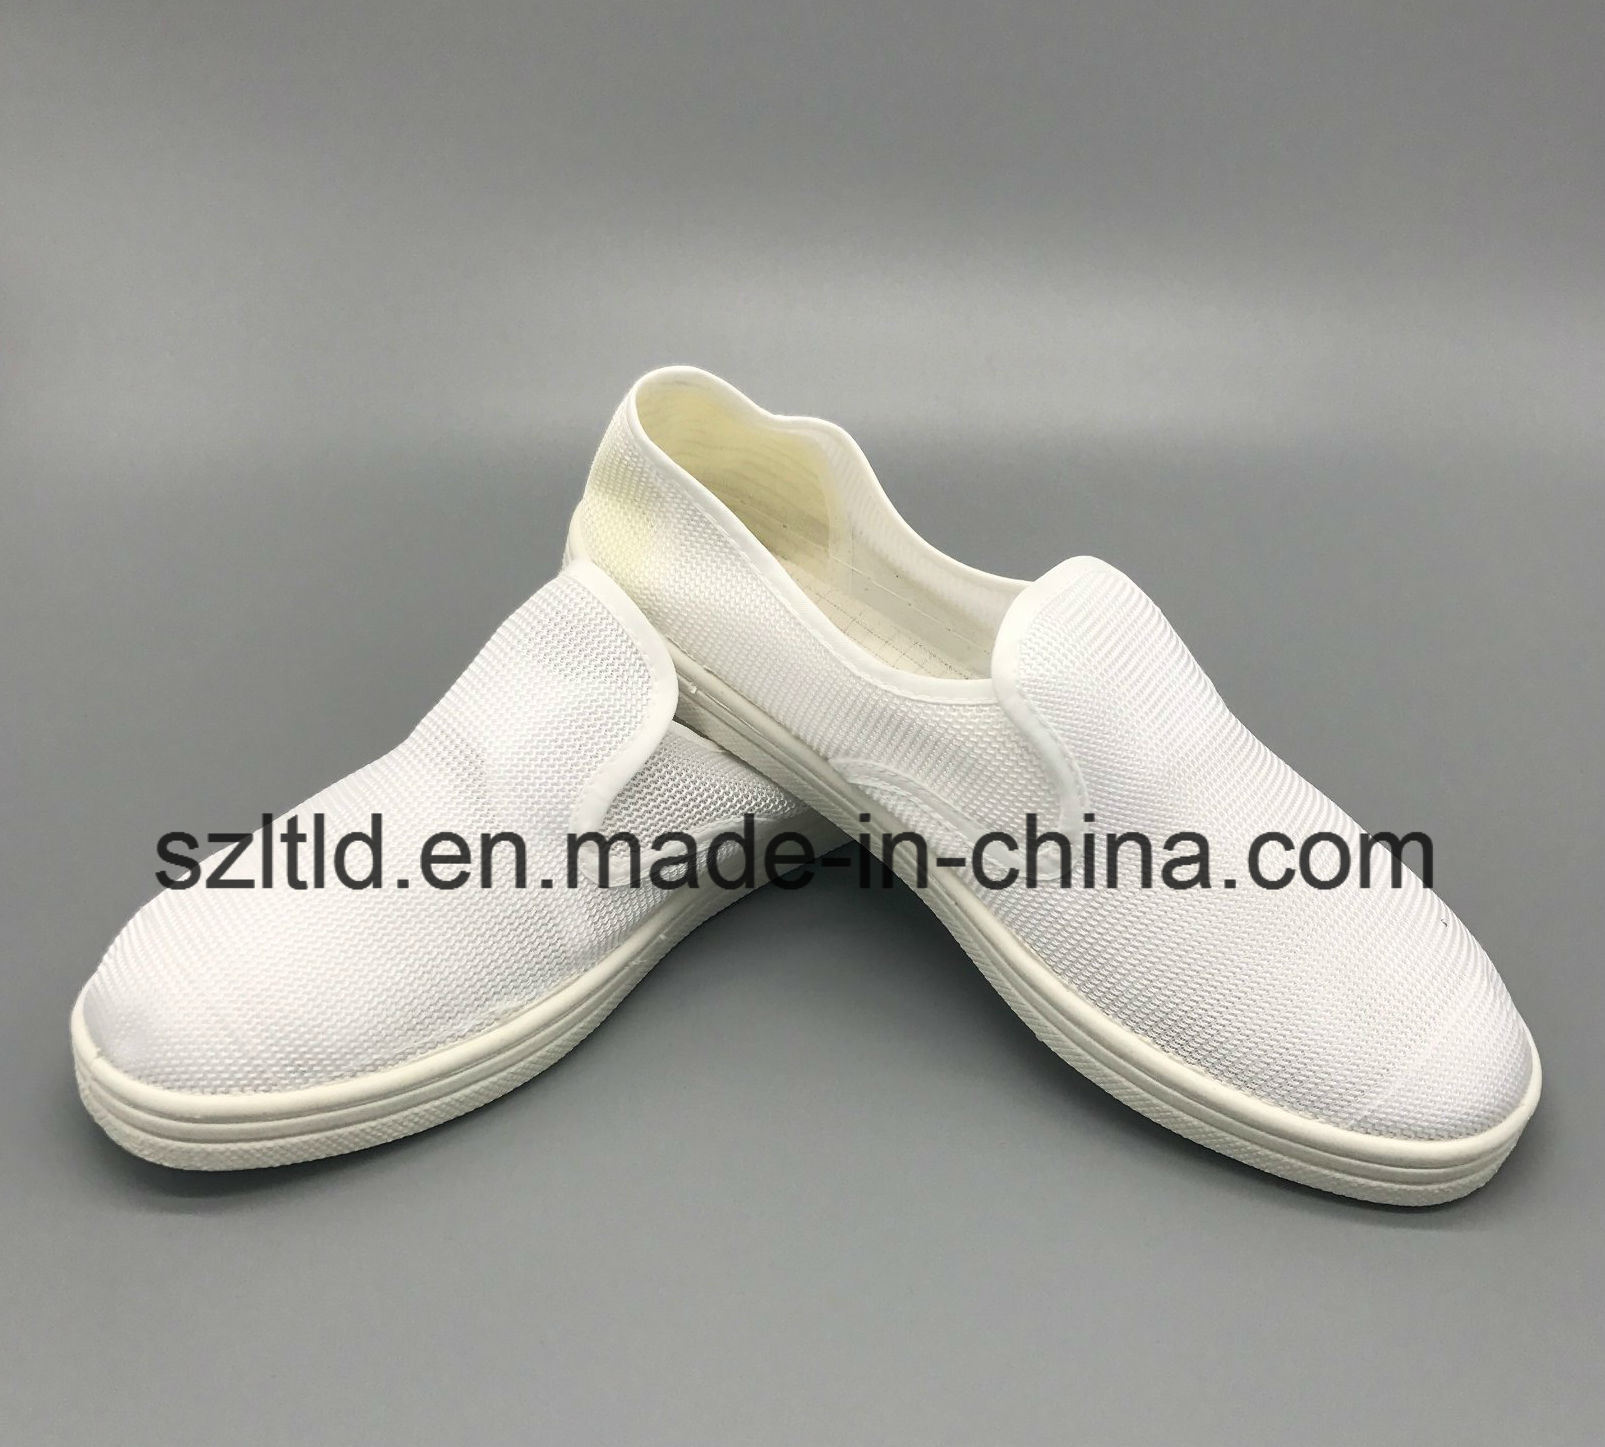 white color shoes